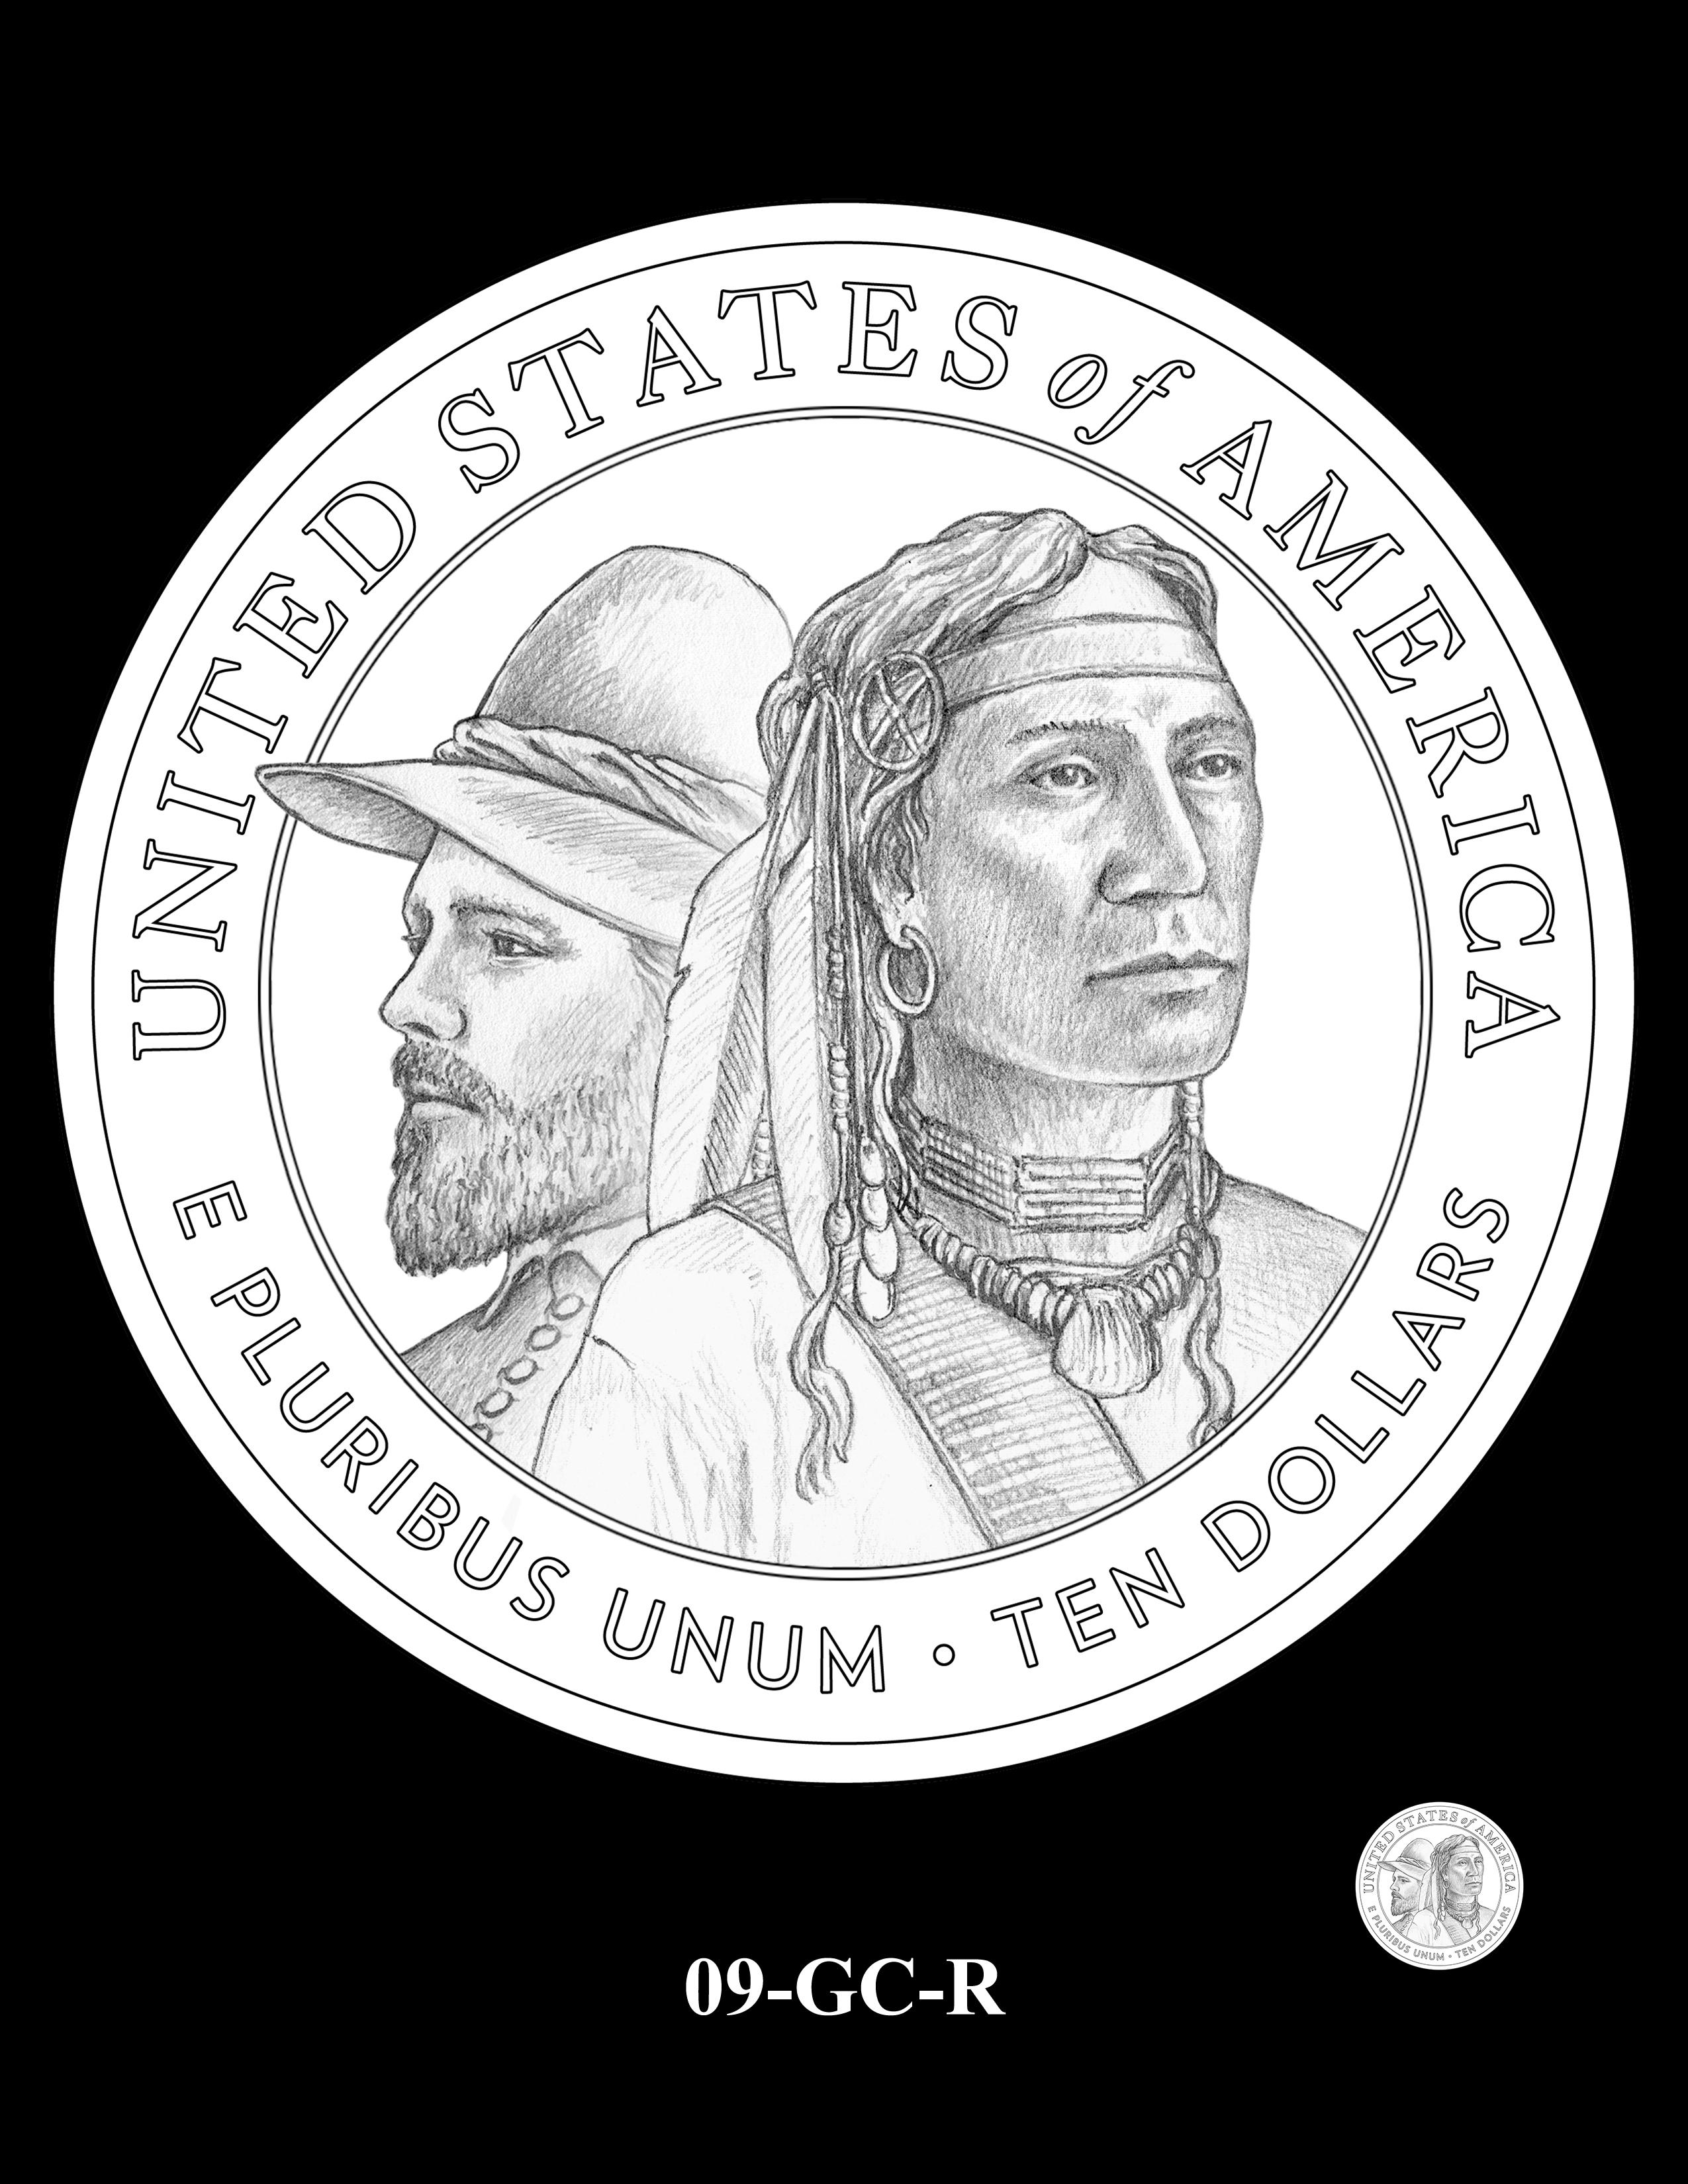 09-GC-R - 2020 Mayflower 400th Anniversary 24K Gold Coin & Silver Medal Program